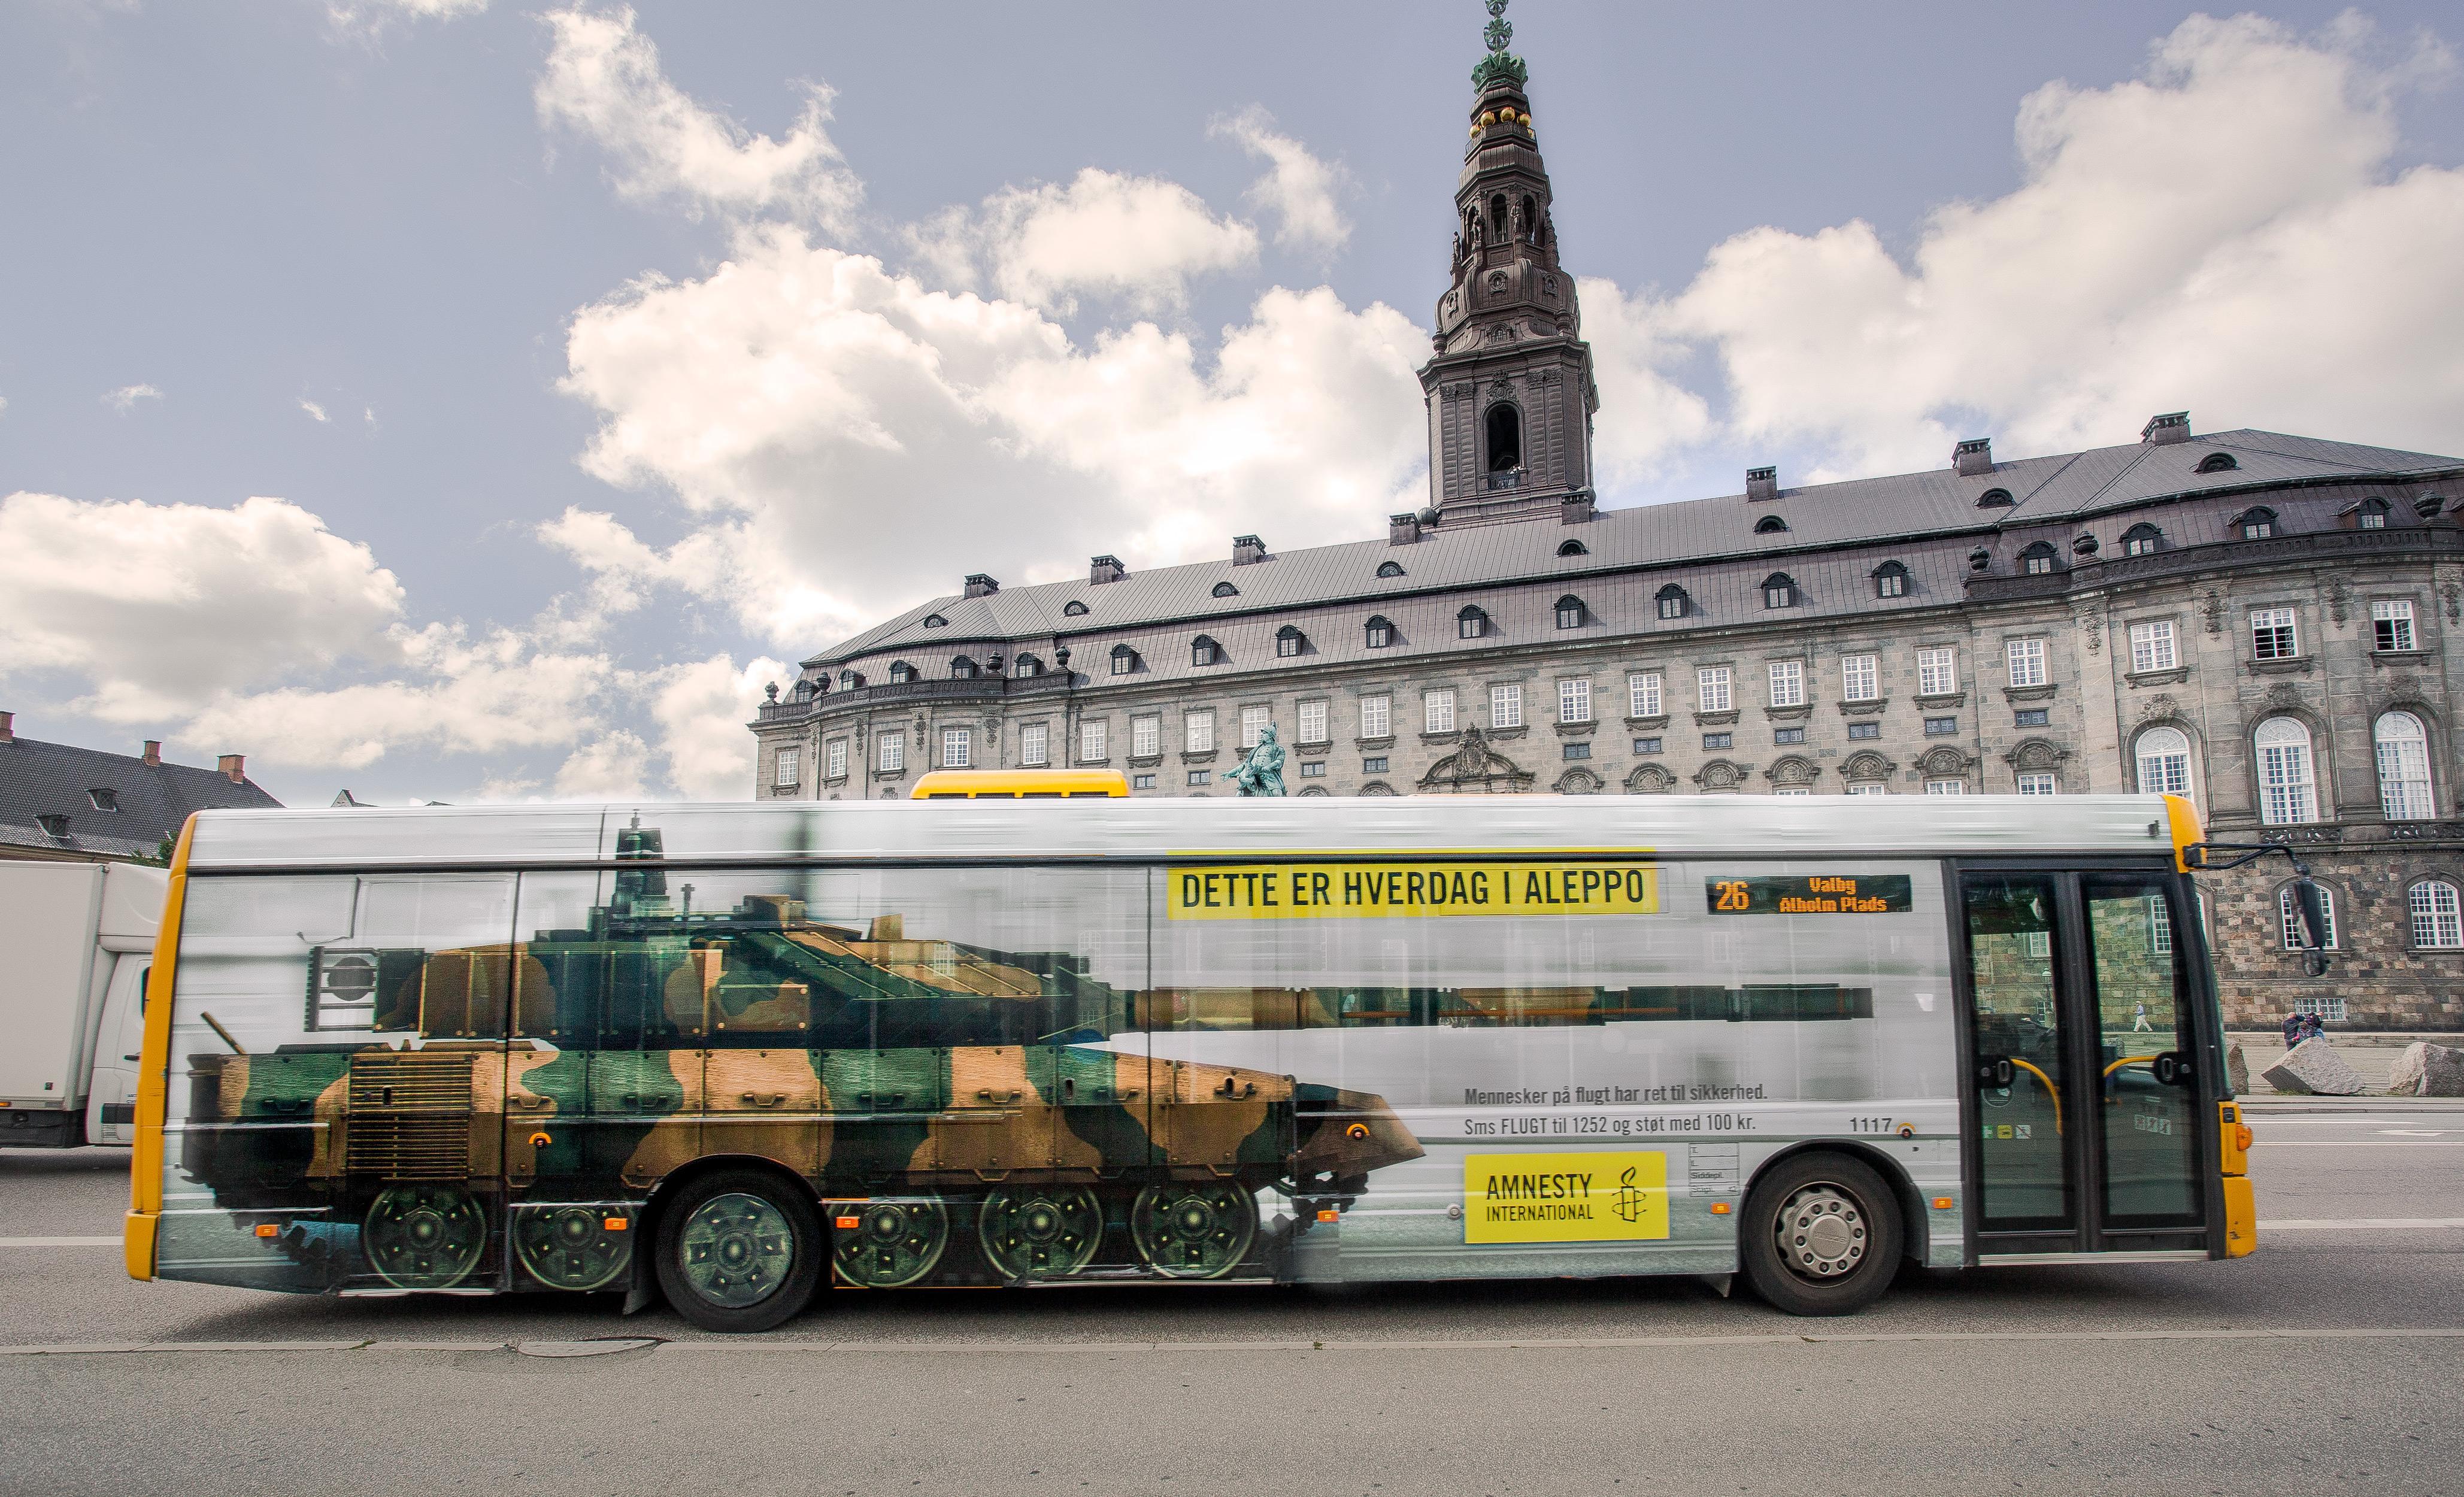 Amnesty International Outdoor Ad - Bus Tank